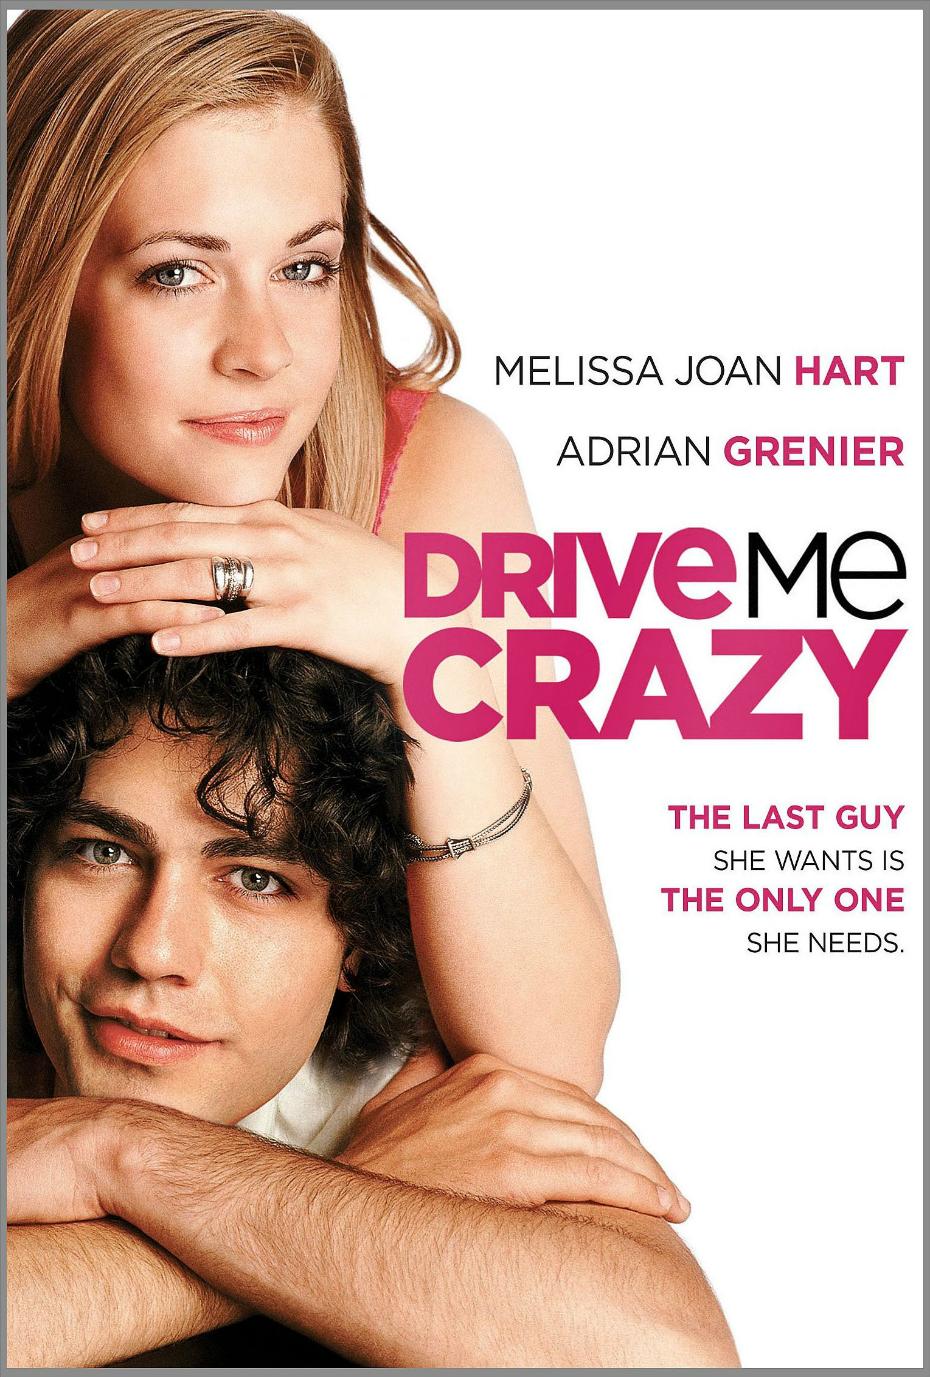 drive-me-crazy-movie-poster.jpg